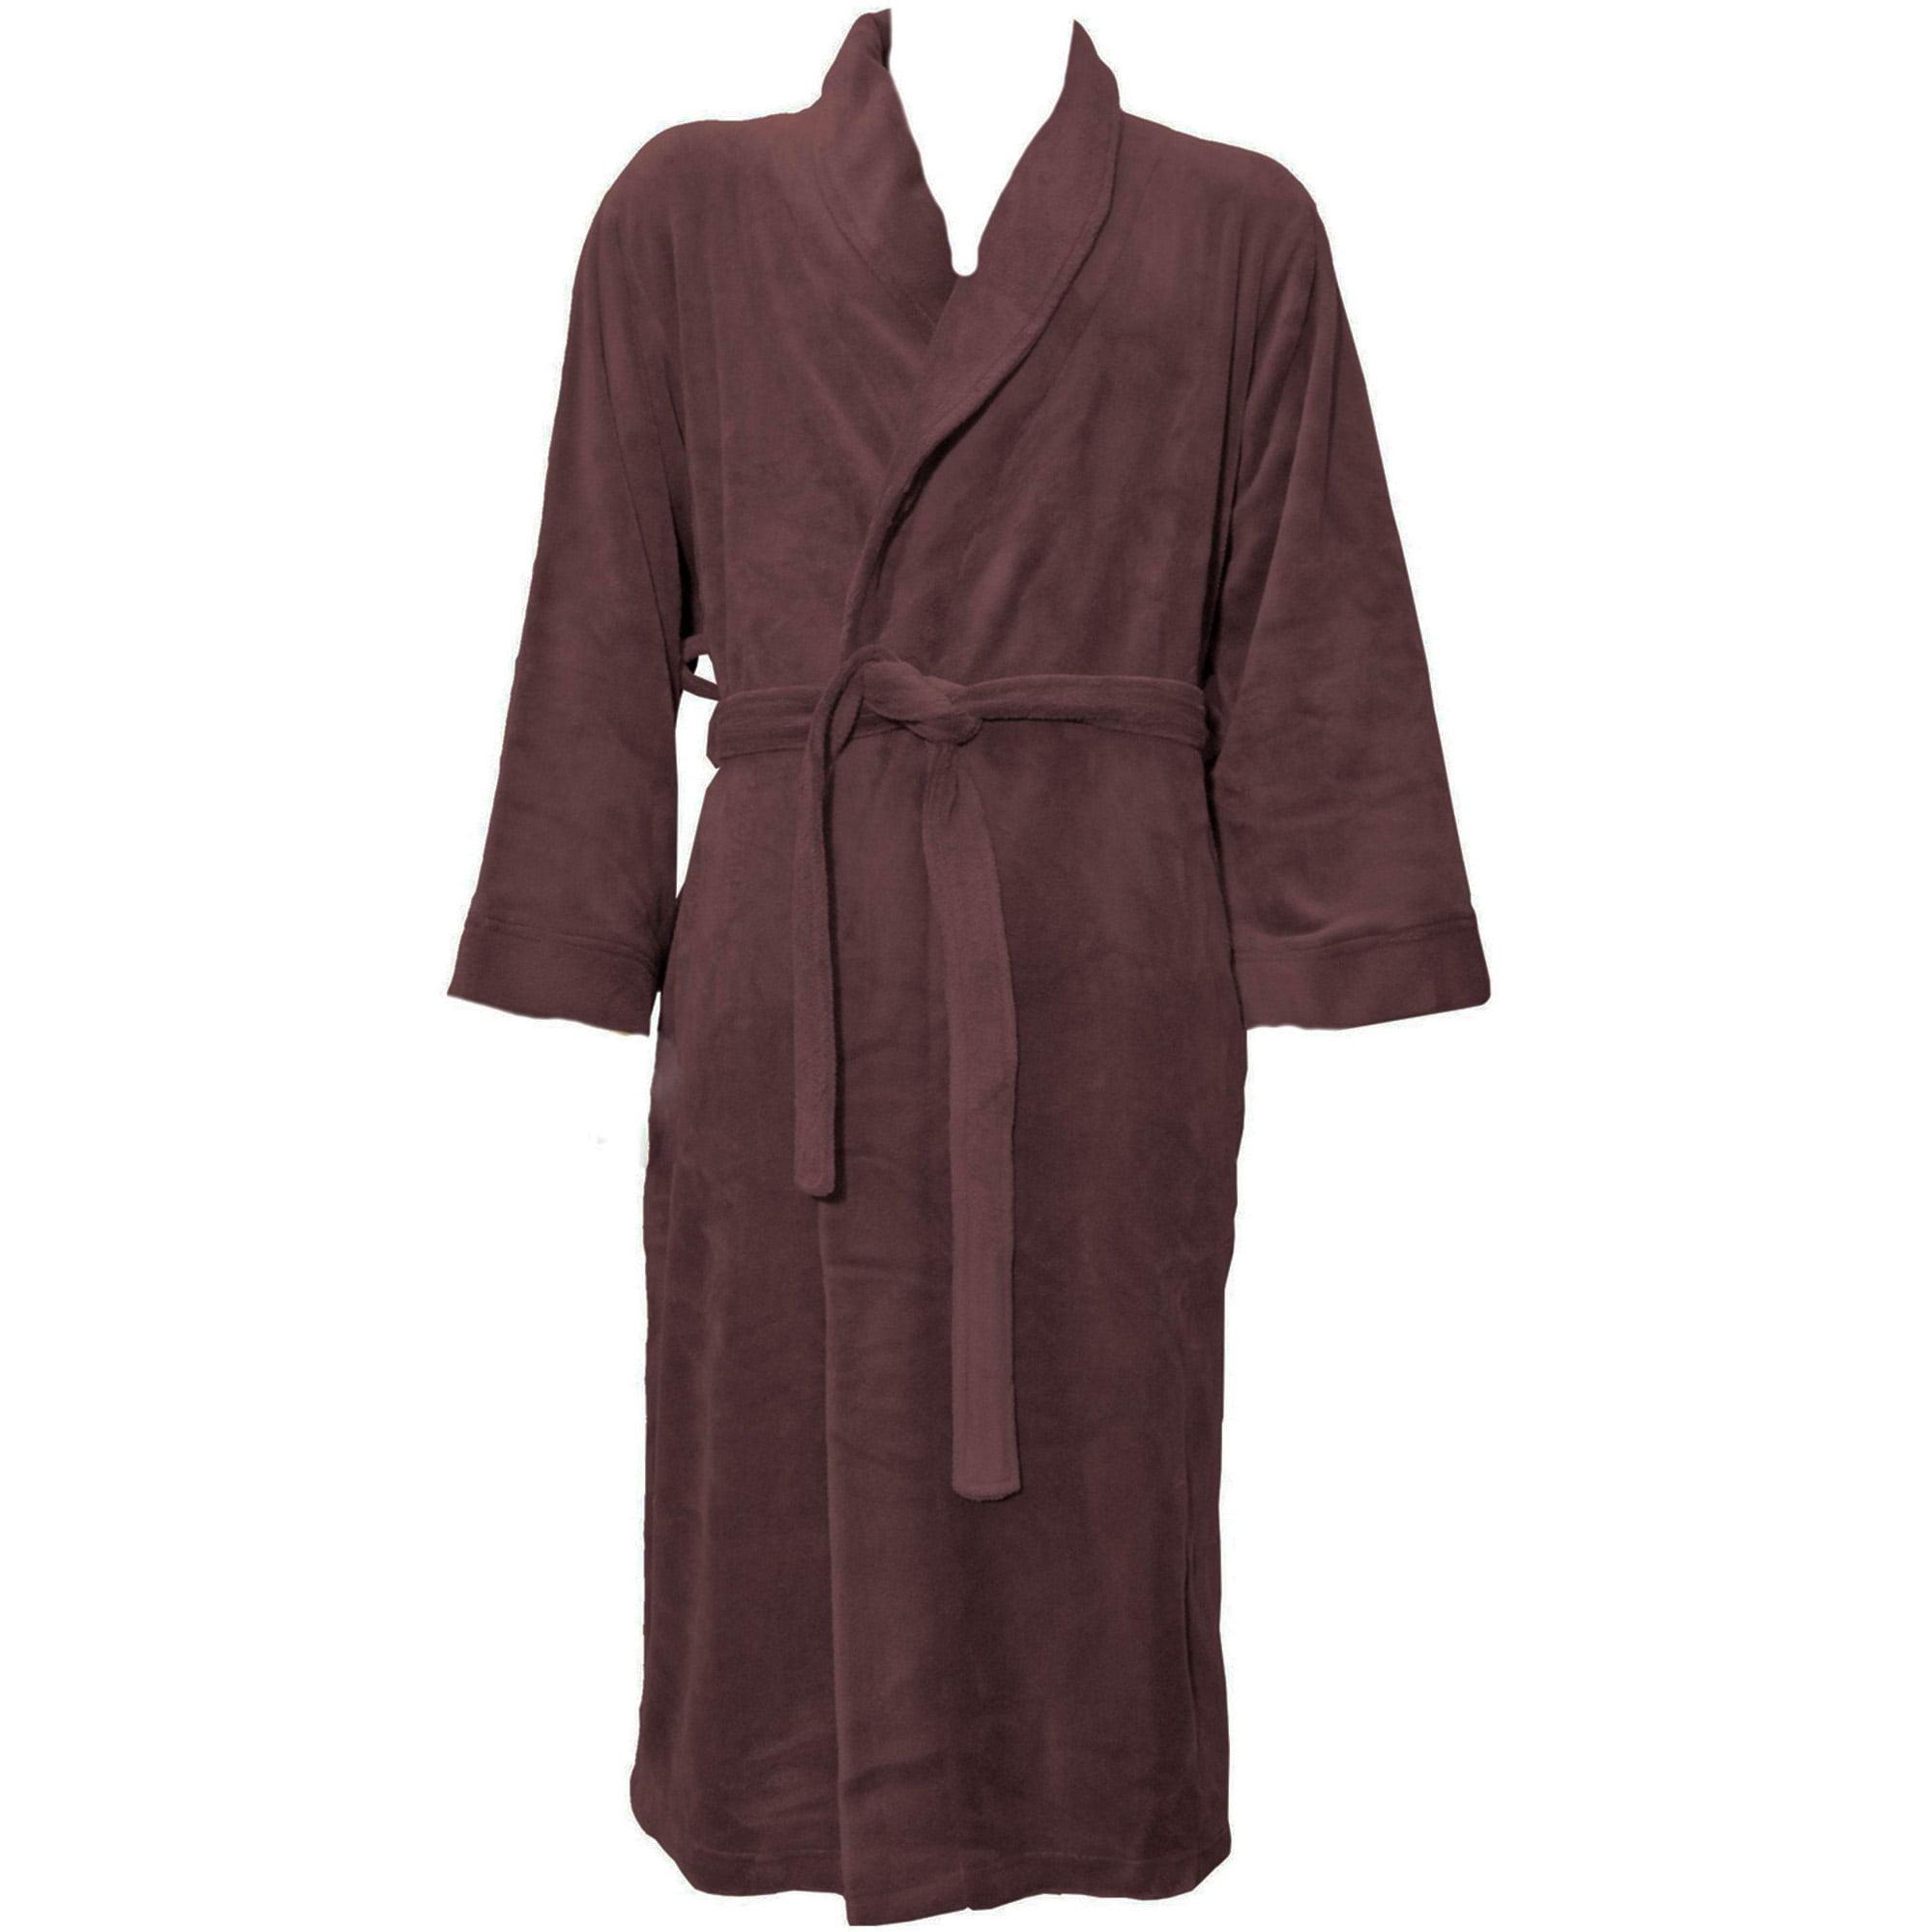 Simplicity Unisex Plush Spa Hotel Kimono Bath Robe Bathrobe Sleepwear by